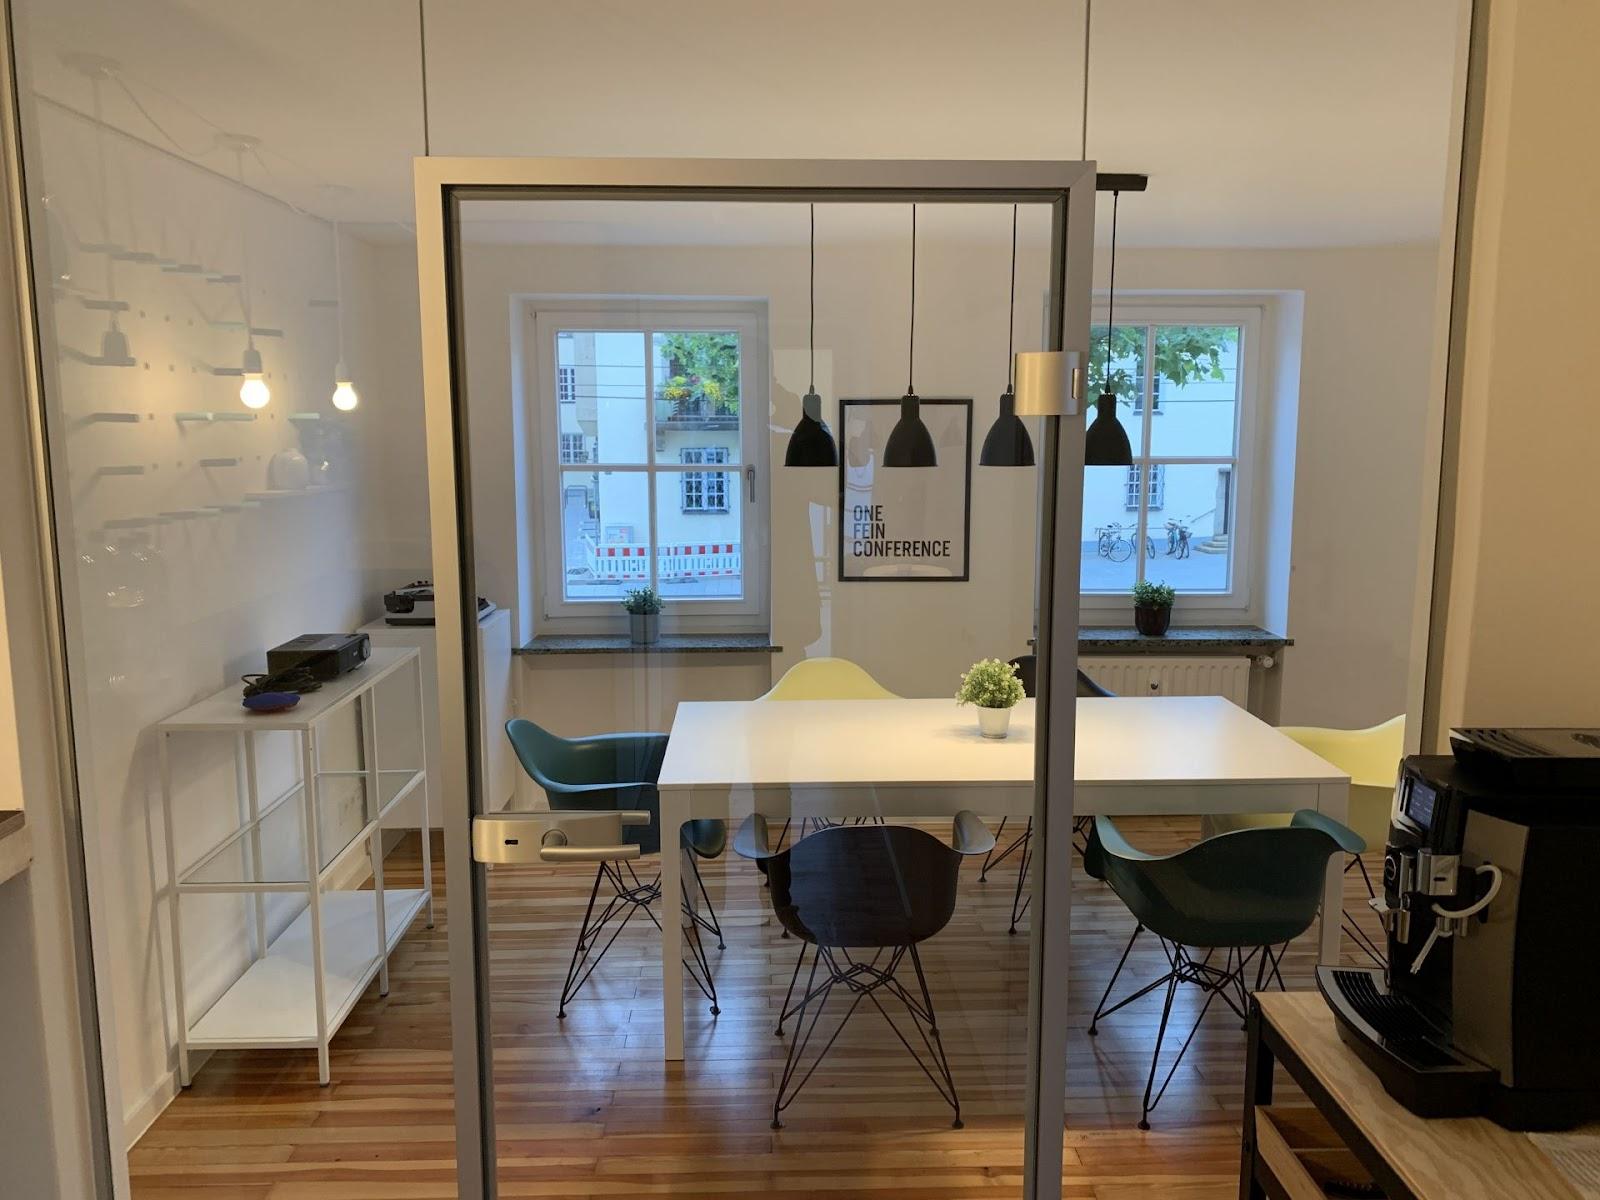 9 Best Coworking Space in Munich, Germany [2020 List] 18